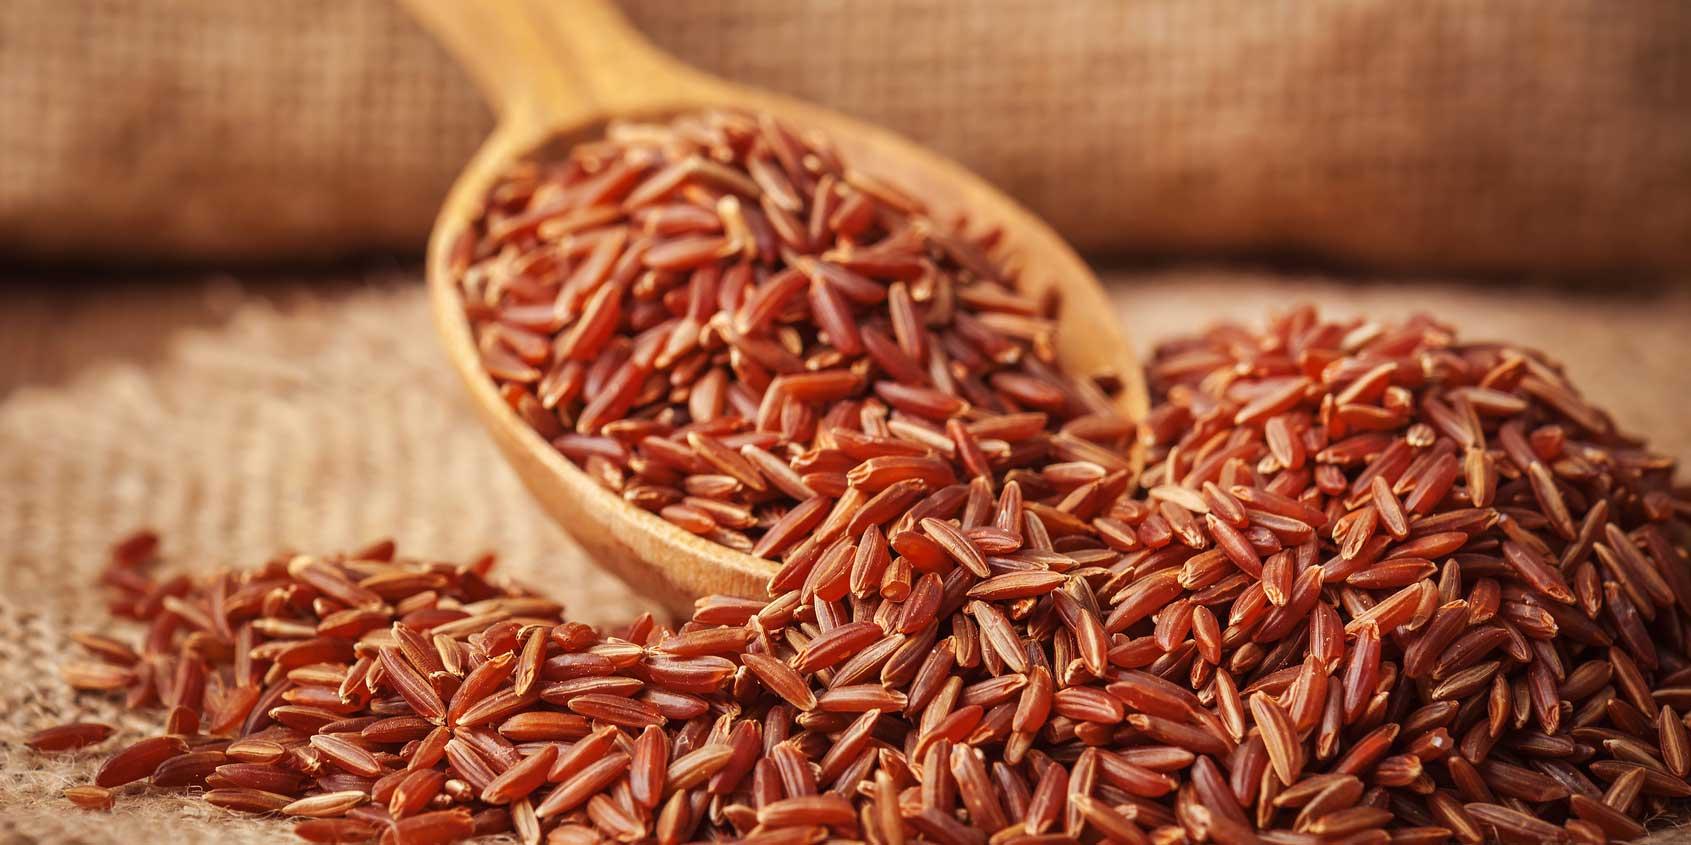 gạo lứt giá bao nhiêu  gạo lứt giá bao nhiêu Mua gạo lứt giá bao nhiêu thì hợp lí? gao lut gia bao nhieu